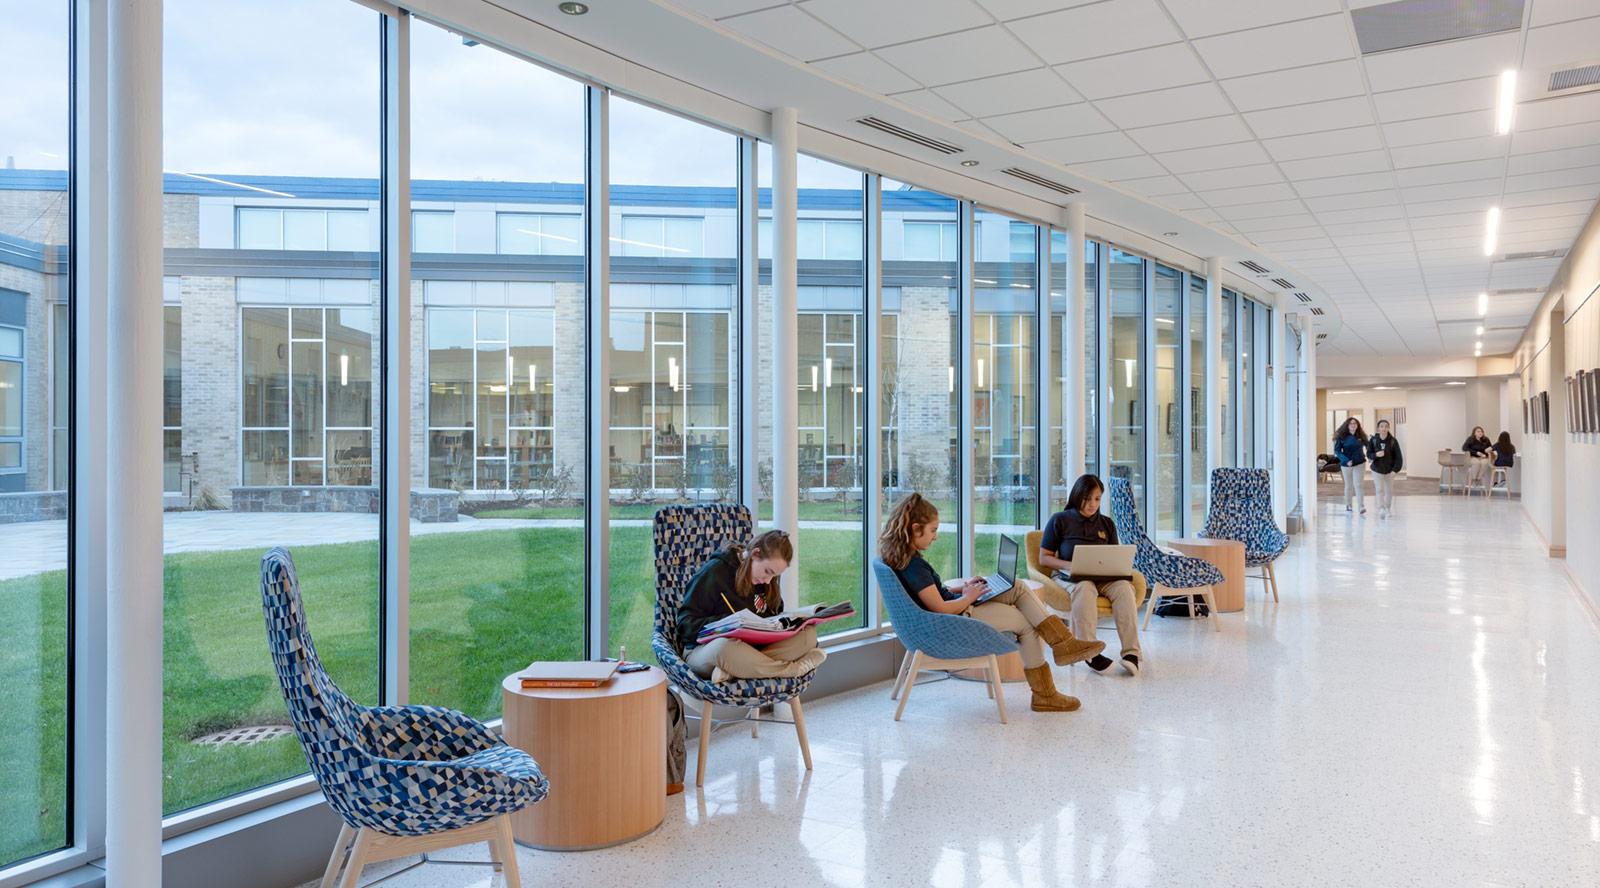 Malden Catholic High School, School for Girls